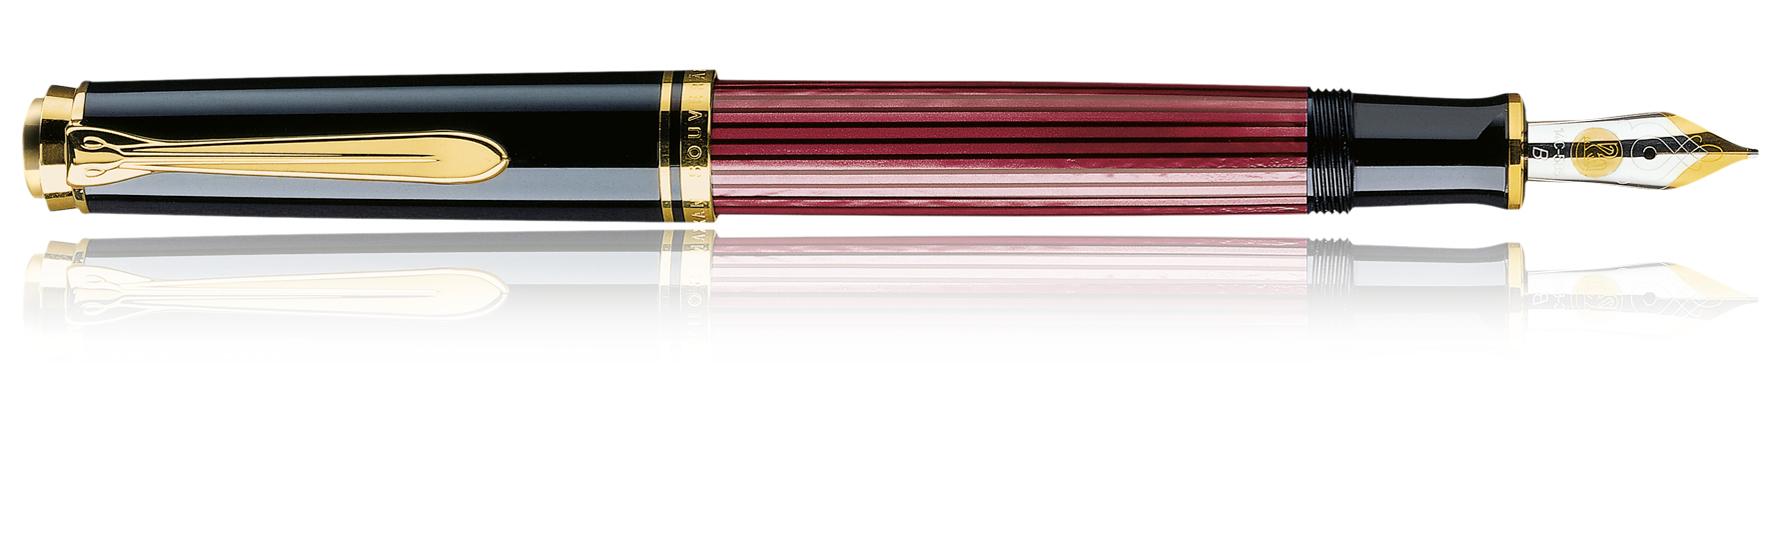 Pelikan Souverän M400 - Schwarz - Gold - Rot - Blau - Gold - 1 Stück(e)